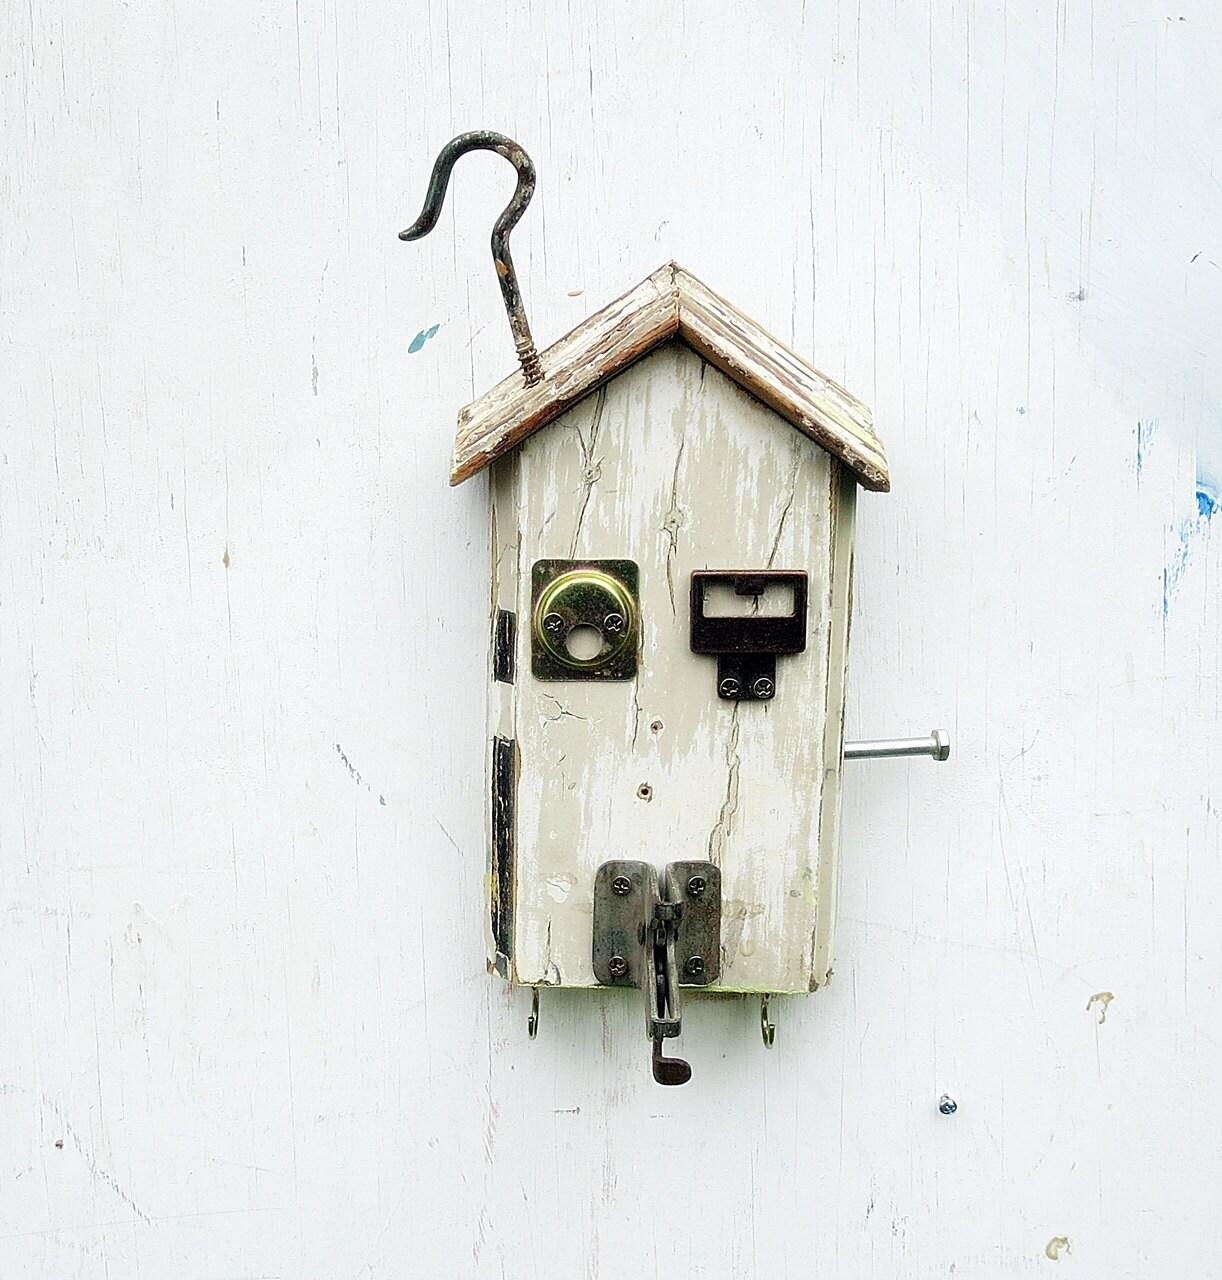 Wood Key Holder Rustic Wood Decor Salvage Art House Key